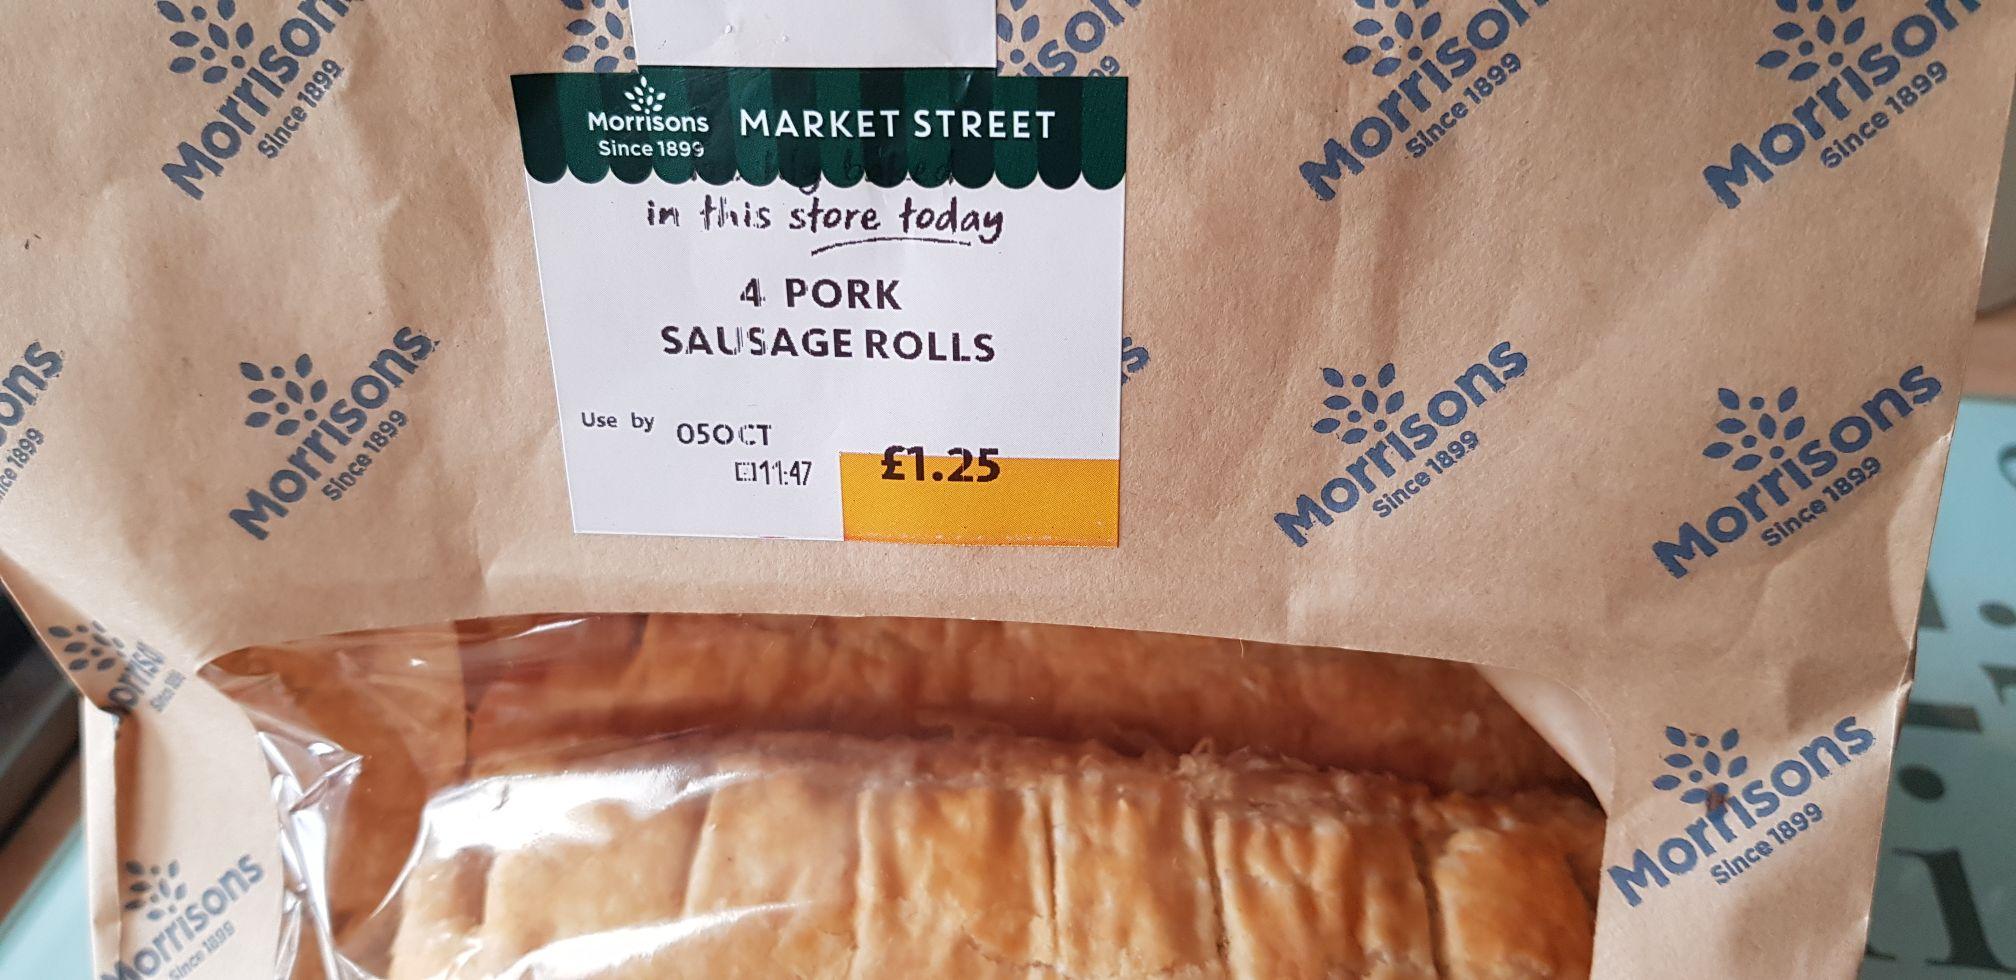 Morrisons pork sausage rolls 4 pack £1.25 instore (Widnes store)